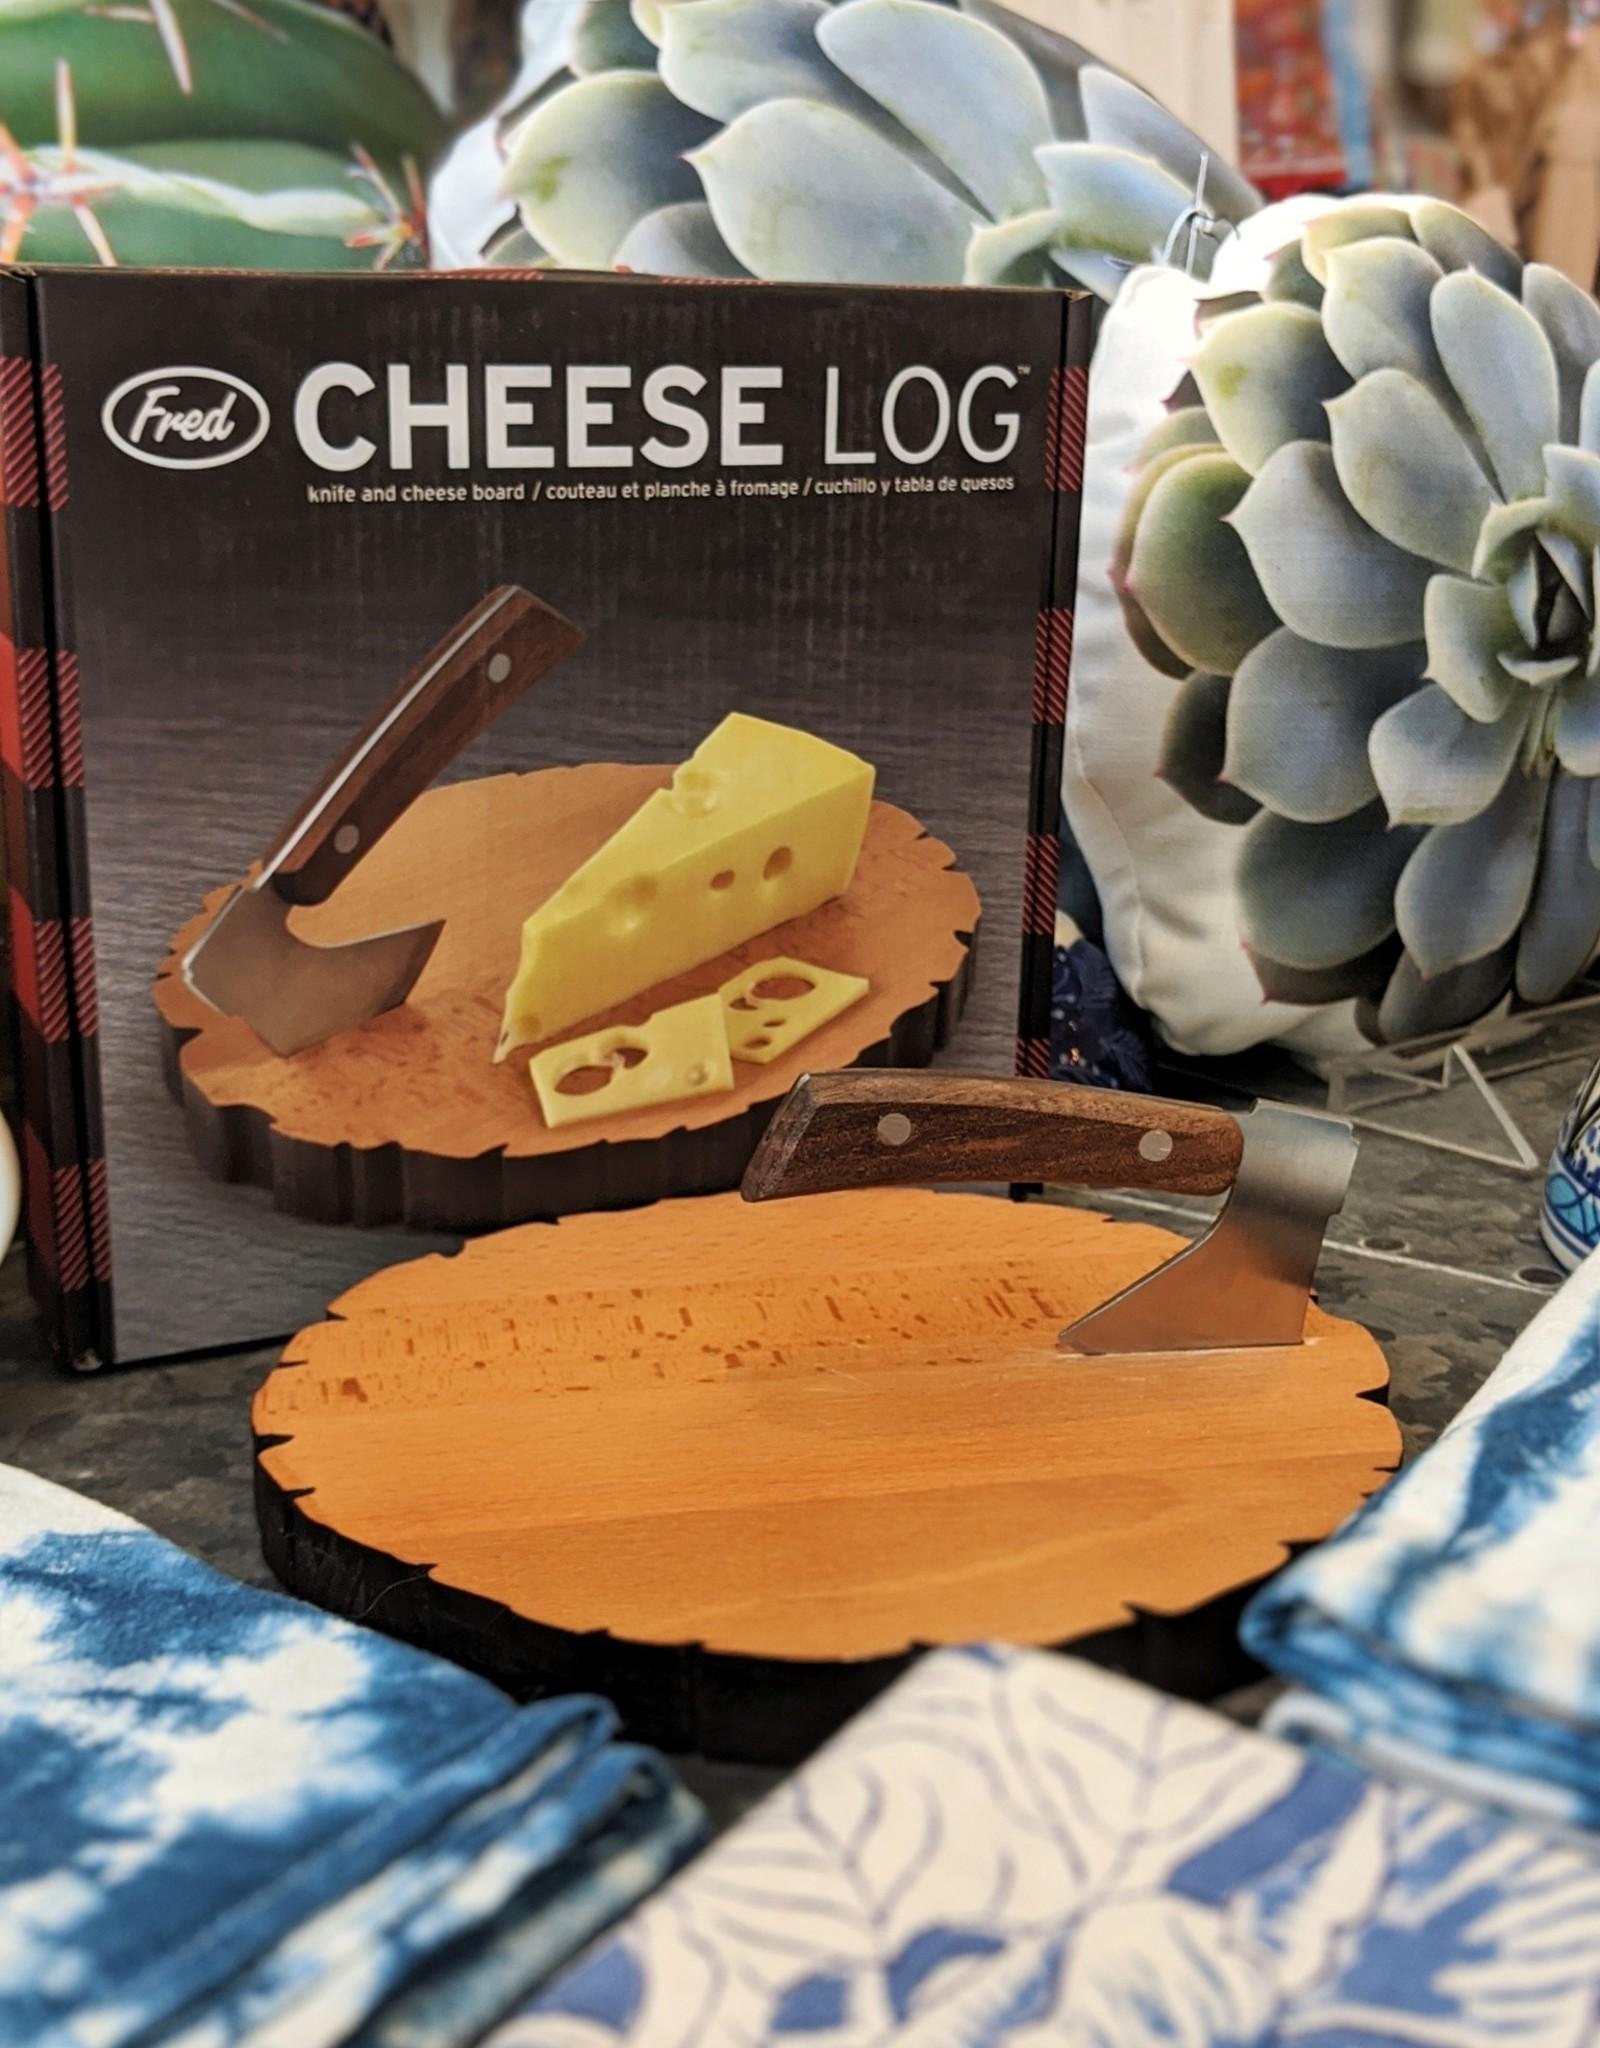 Fred Cheese Log Set